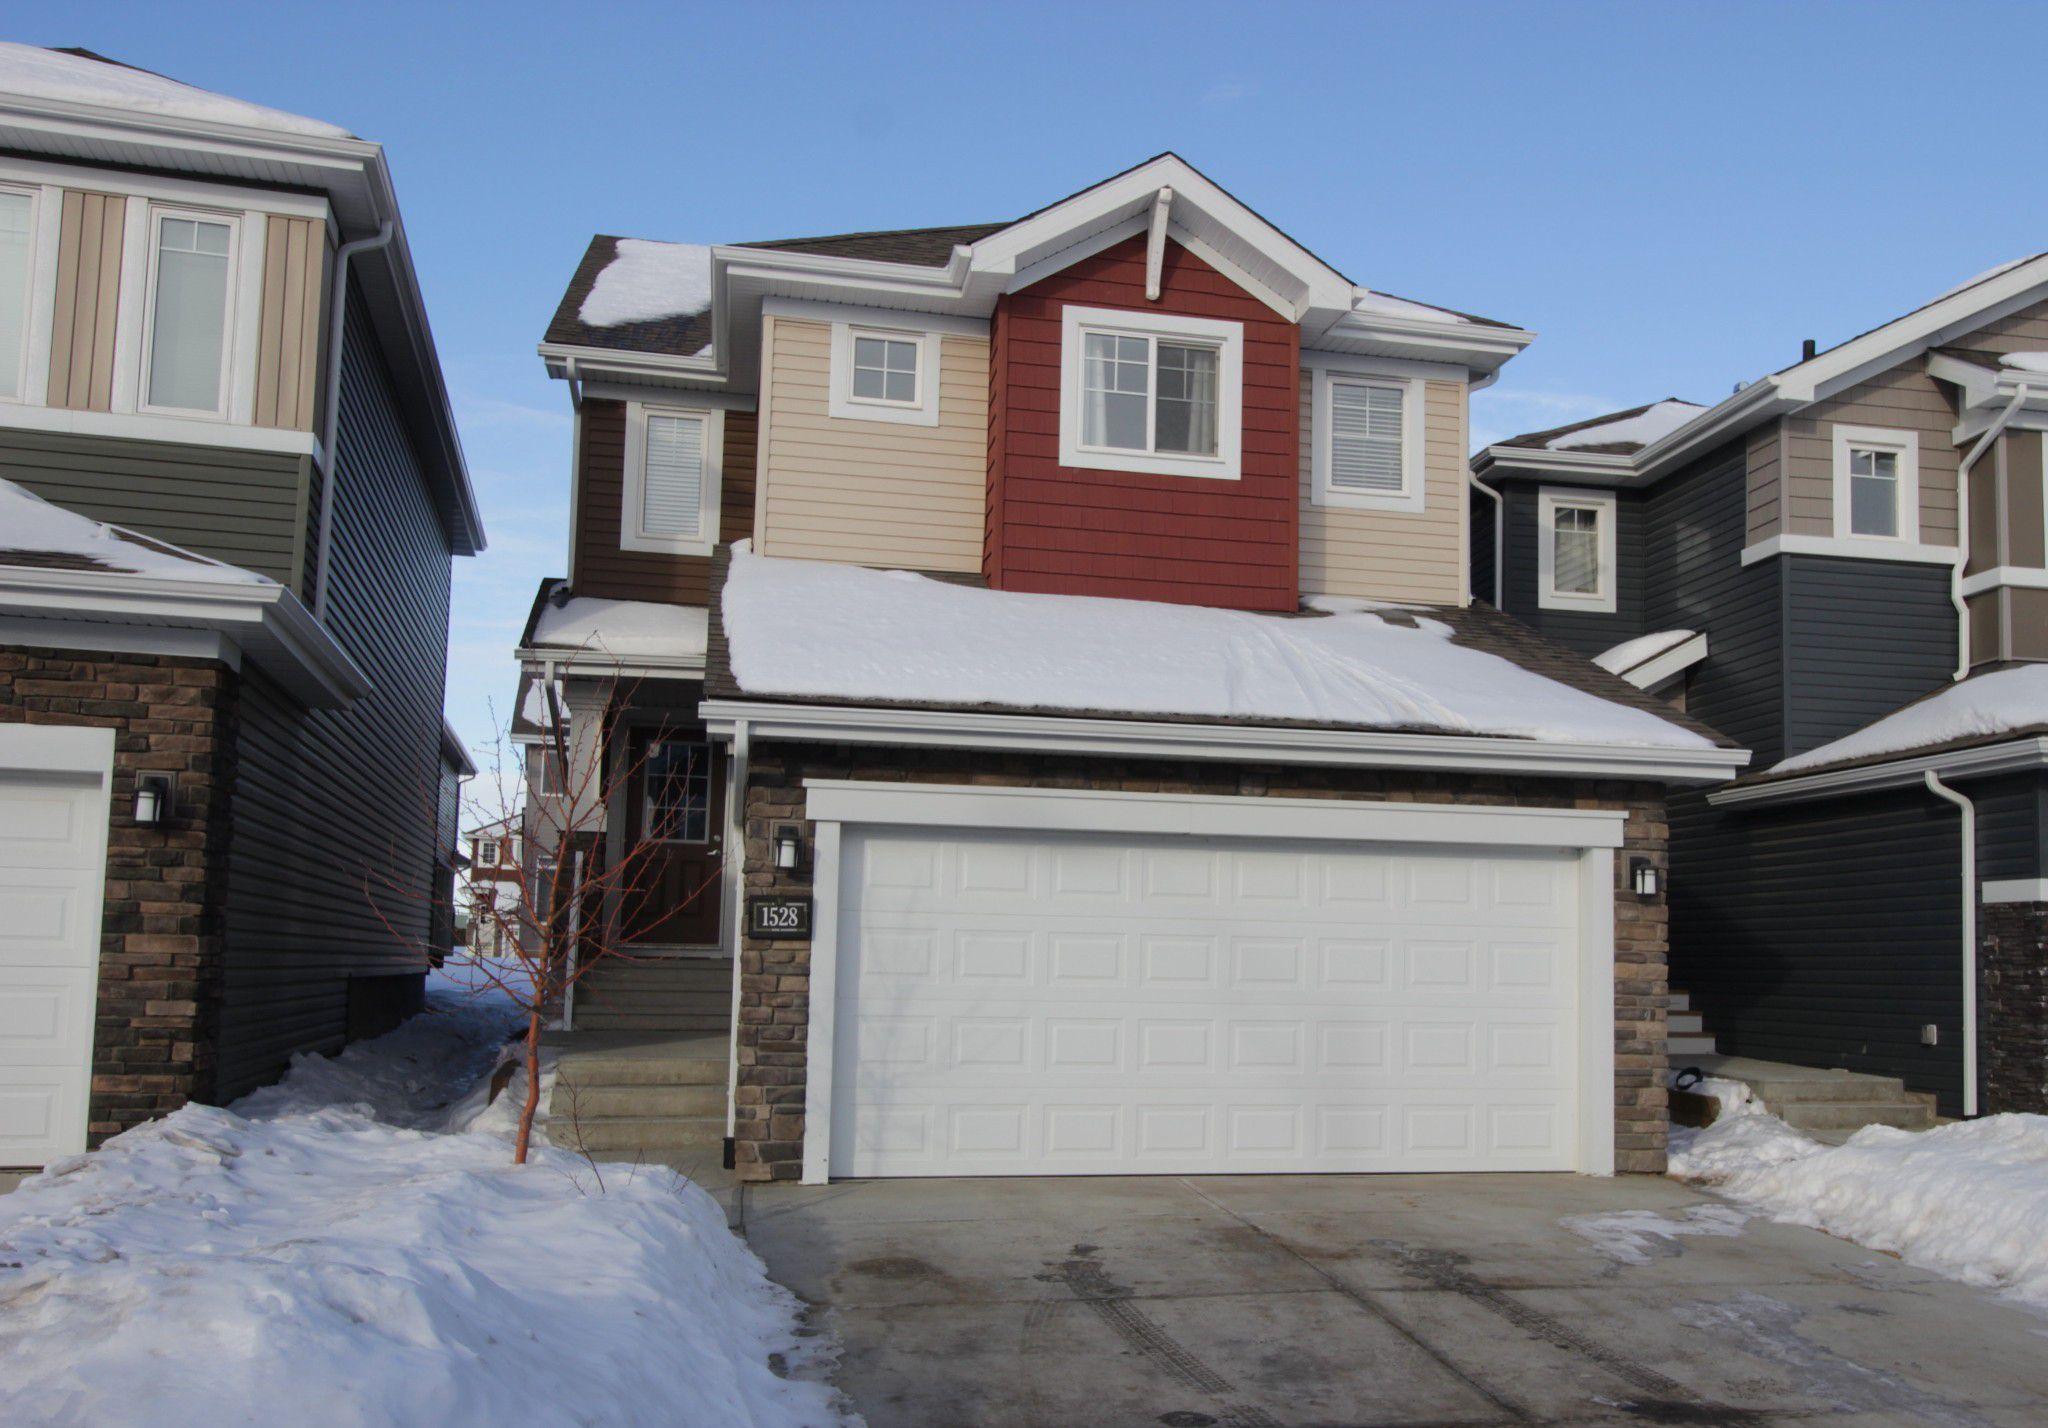 Main Photo: 1528 167 Street SW in Edmonton: House for sale